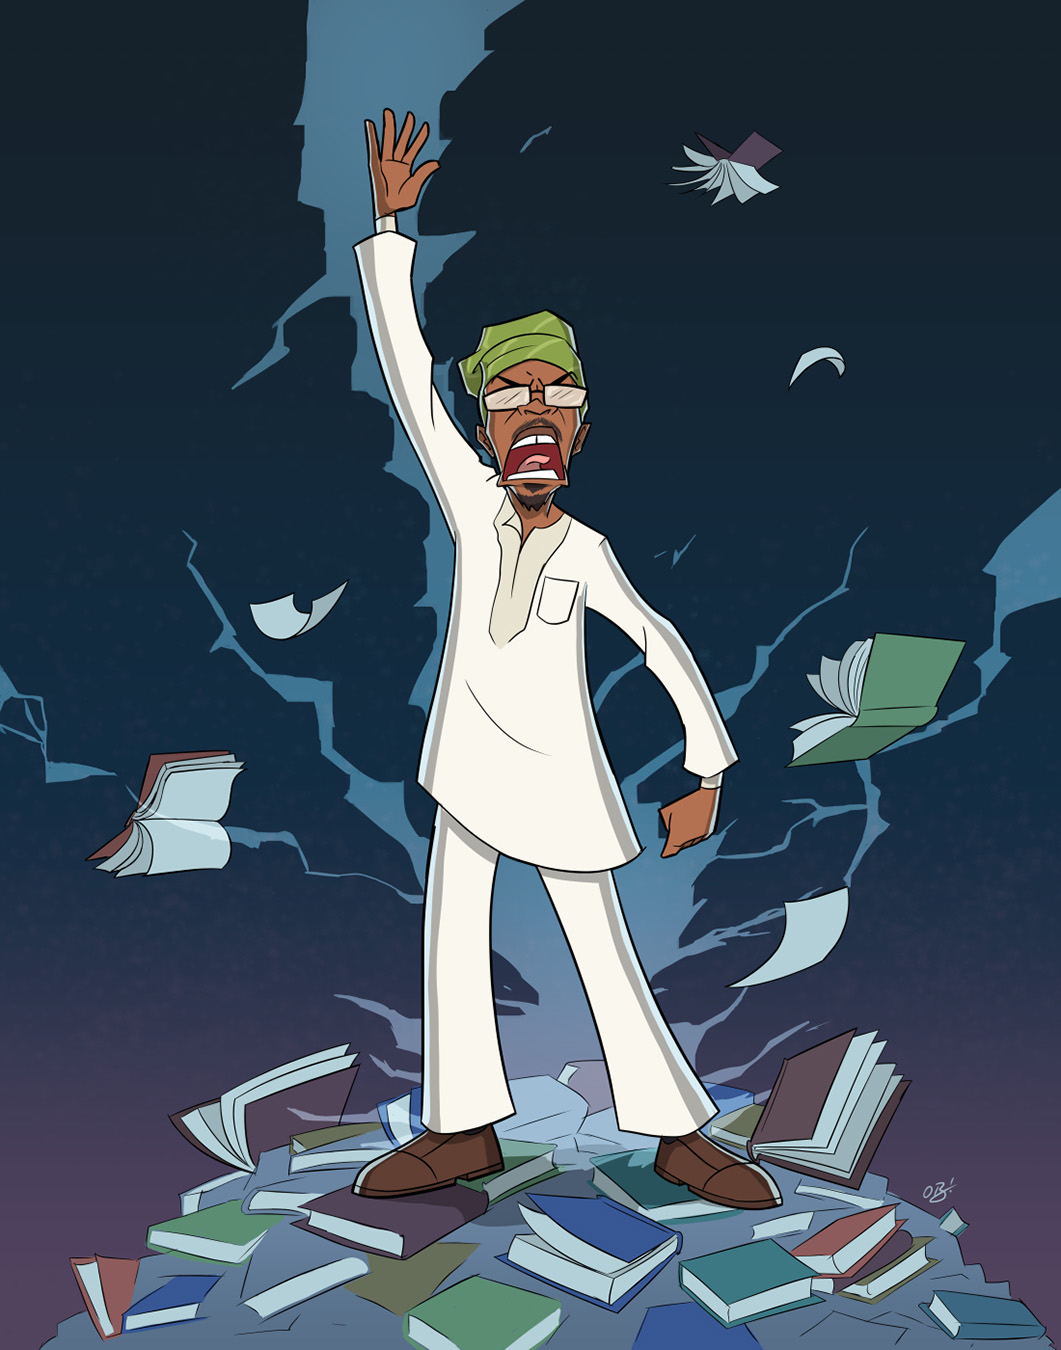 Obi Arisukwu uses his skill to bring more representation into the comic world. (Art by Obi Arisukwu)